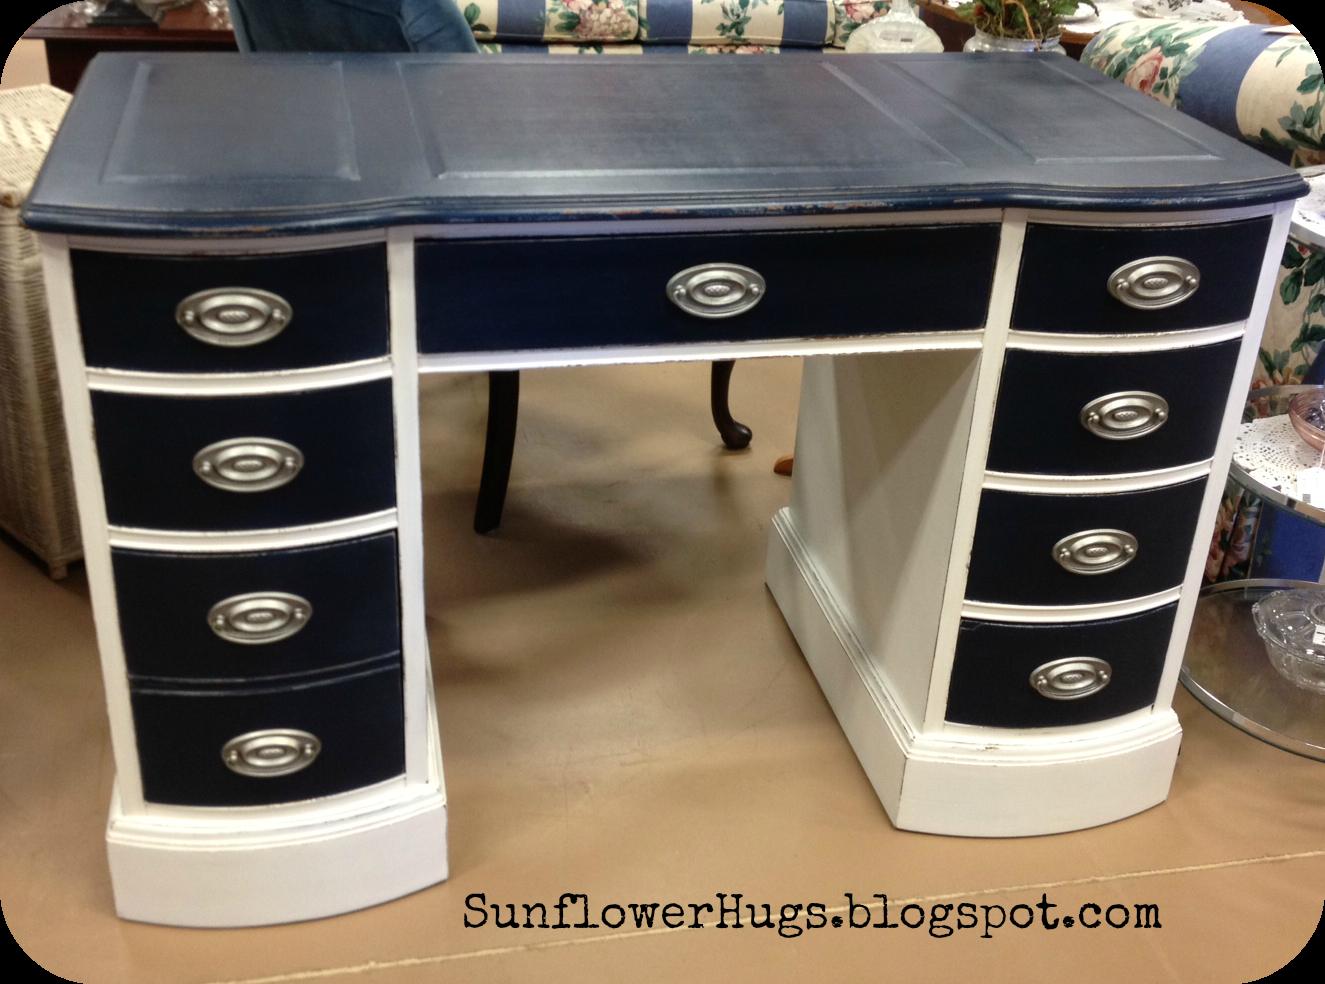 sunflowerhugs nautical desk waxing tip. Black Bedroom Furniture Sets. Home Design Ideas